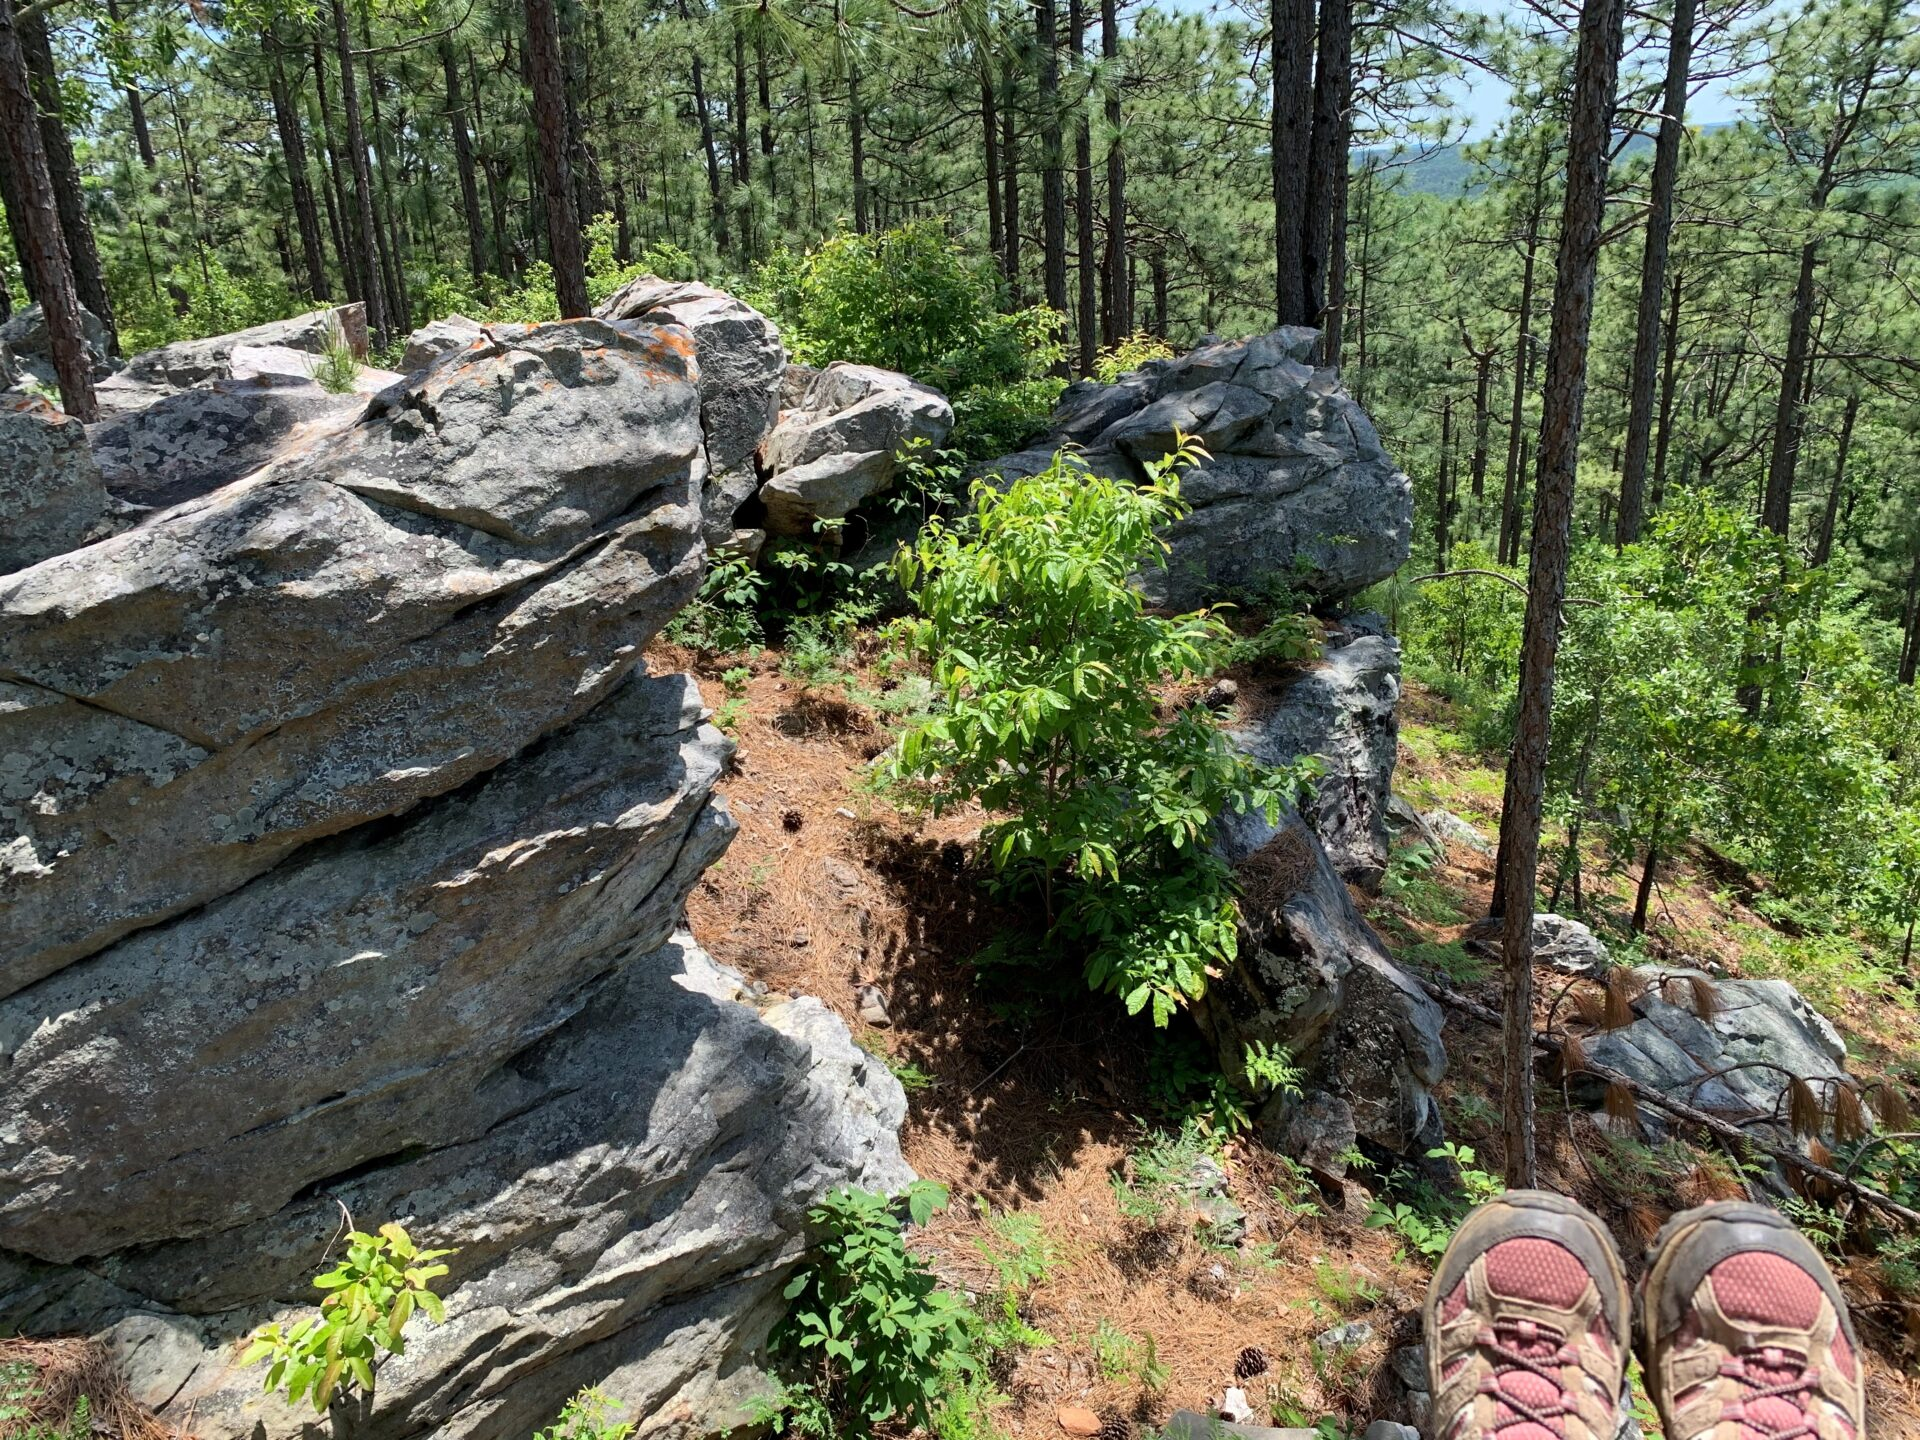 rock bluffs overlooking pine trees